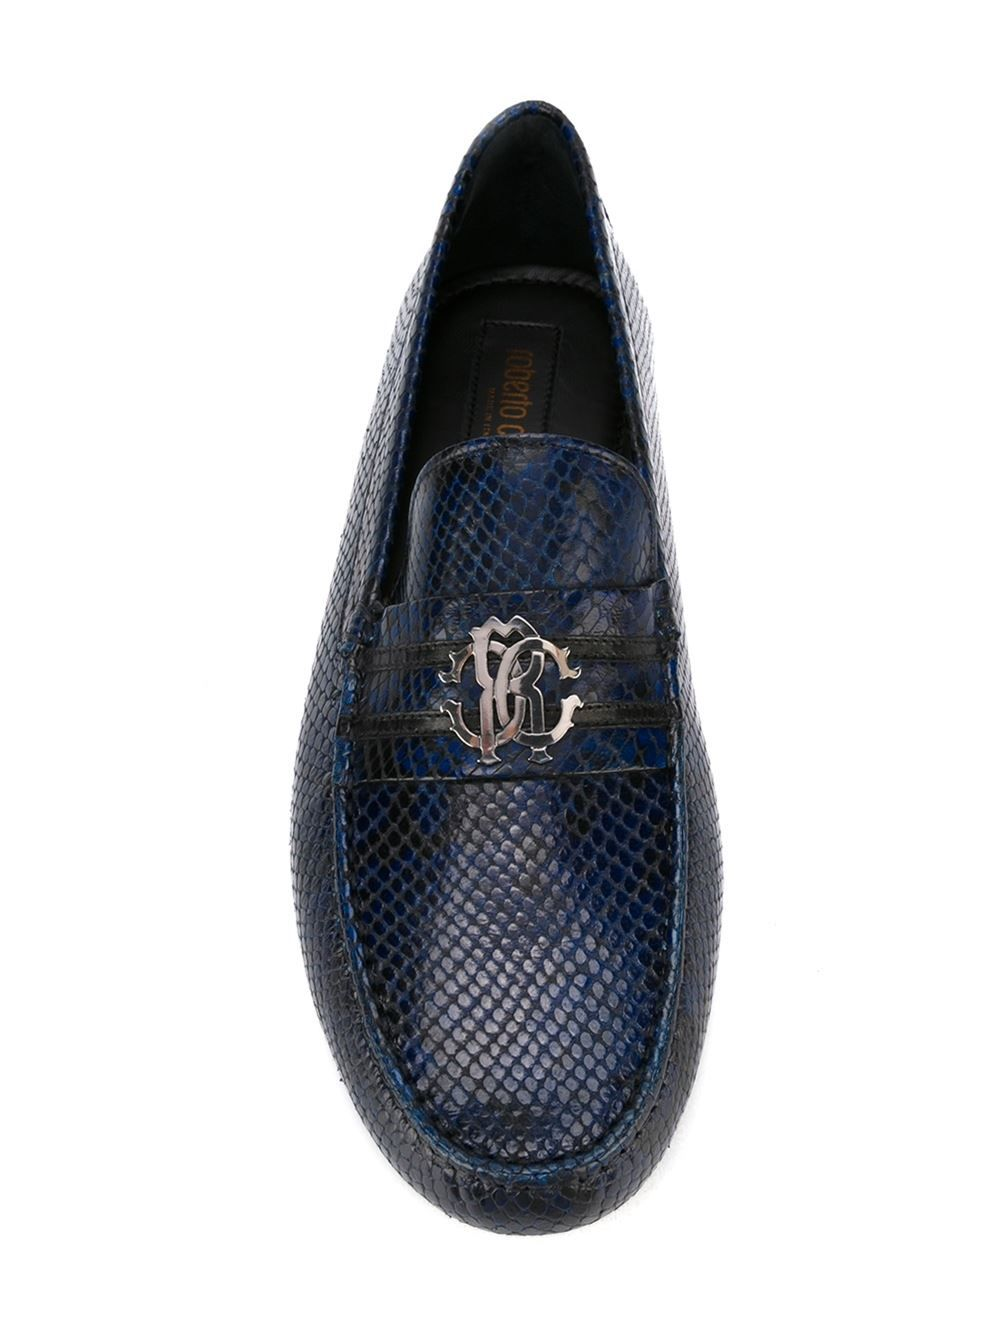 1b5ecaab69305 Roberto Cavalli snakeskin loafers